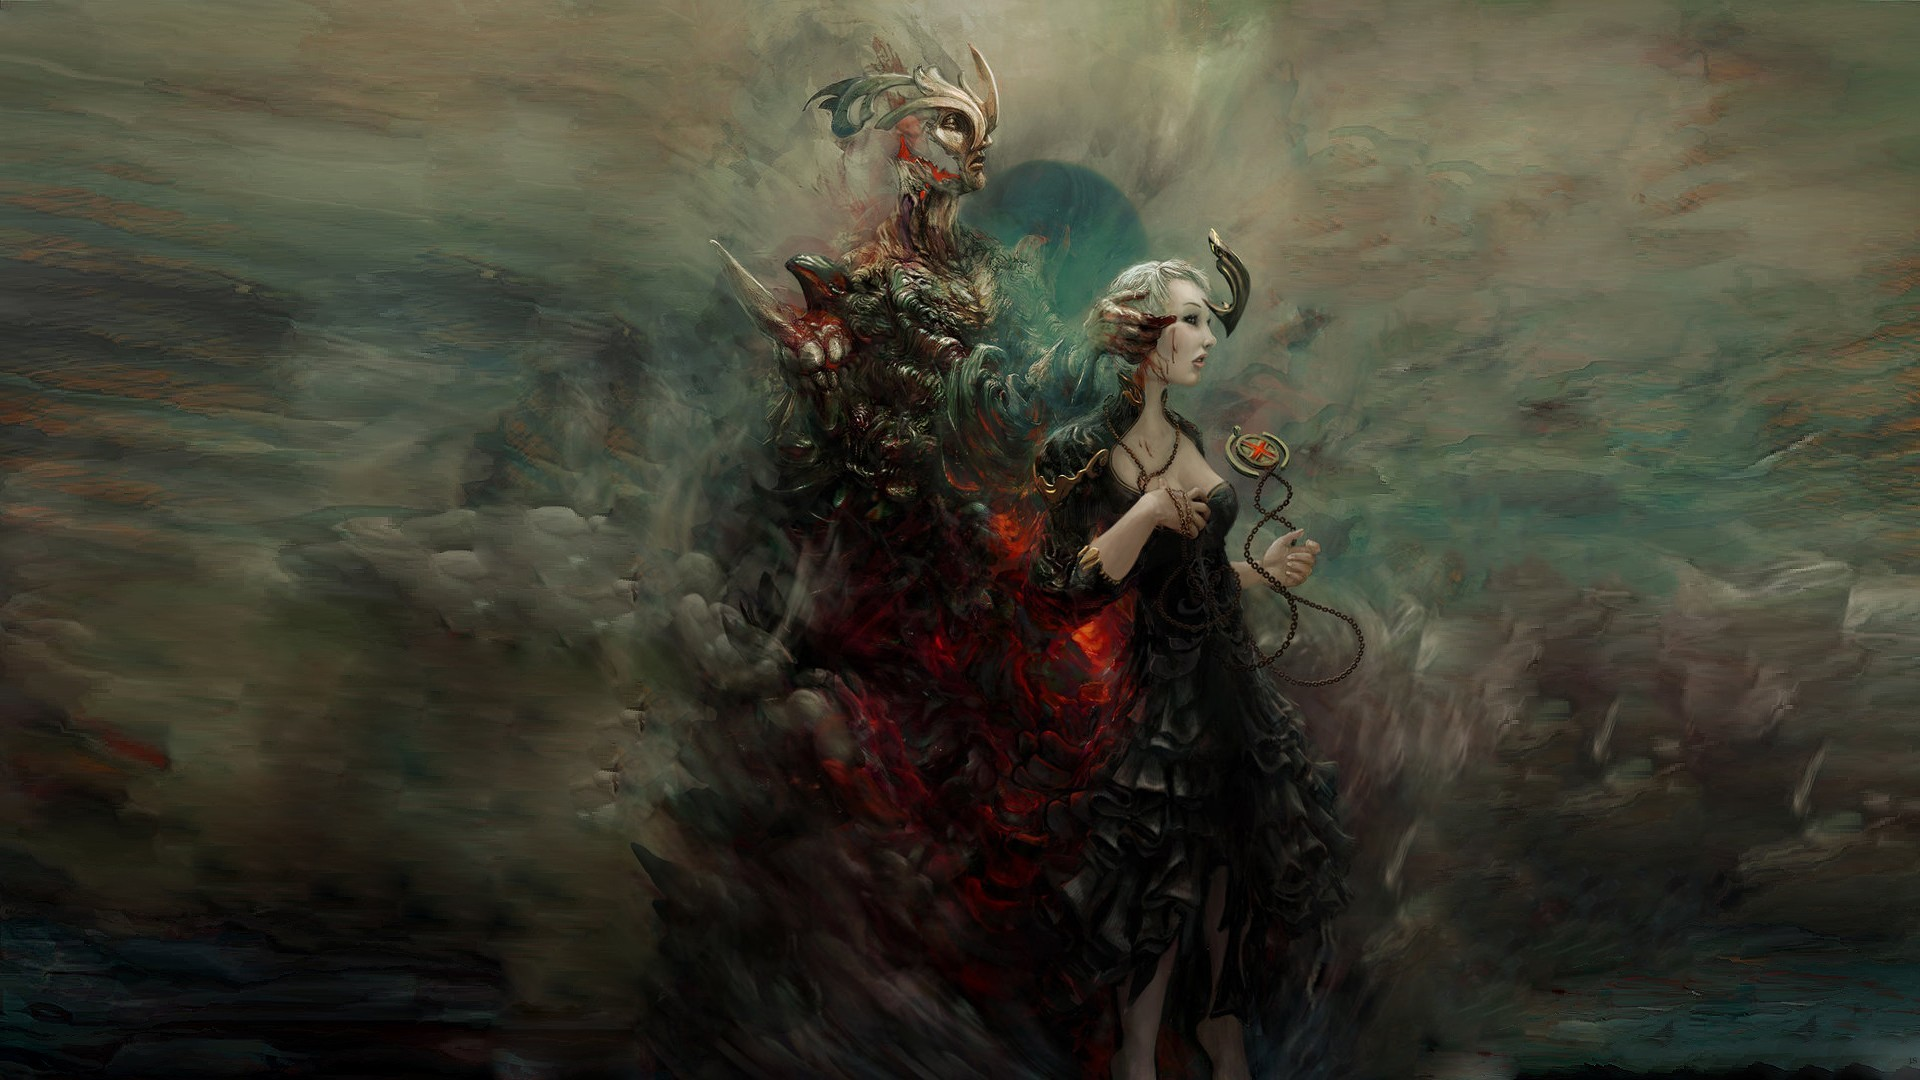 Res: 1920x1080, Rafael Sarmento dark demon satan hell occult horror scary creepy spooky  necklace talisman macabre evil art artistic horns wallpaper |  |  26580 | ...